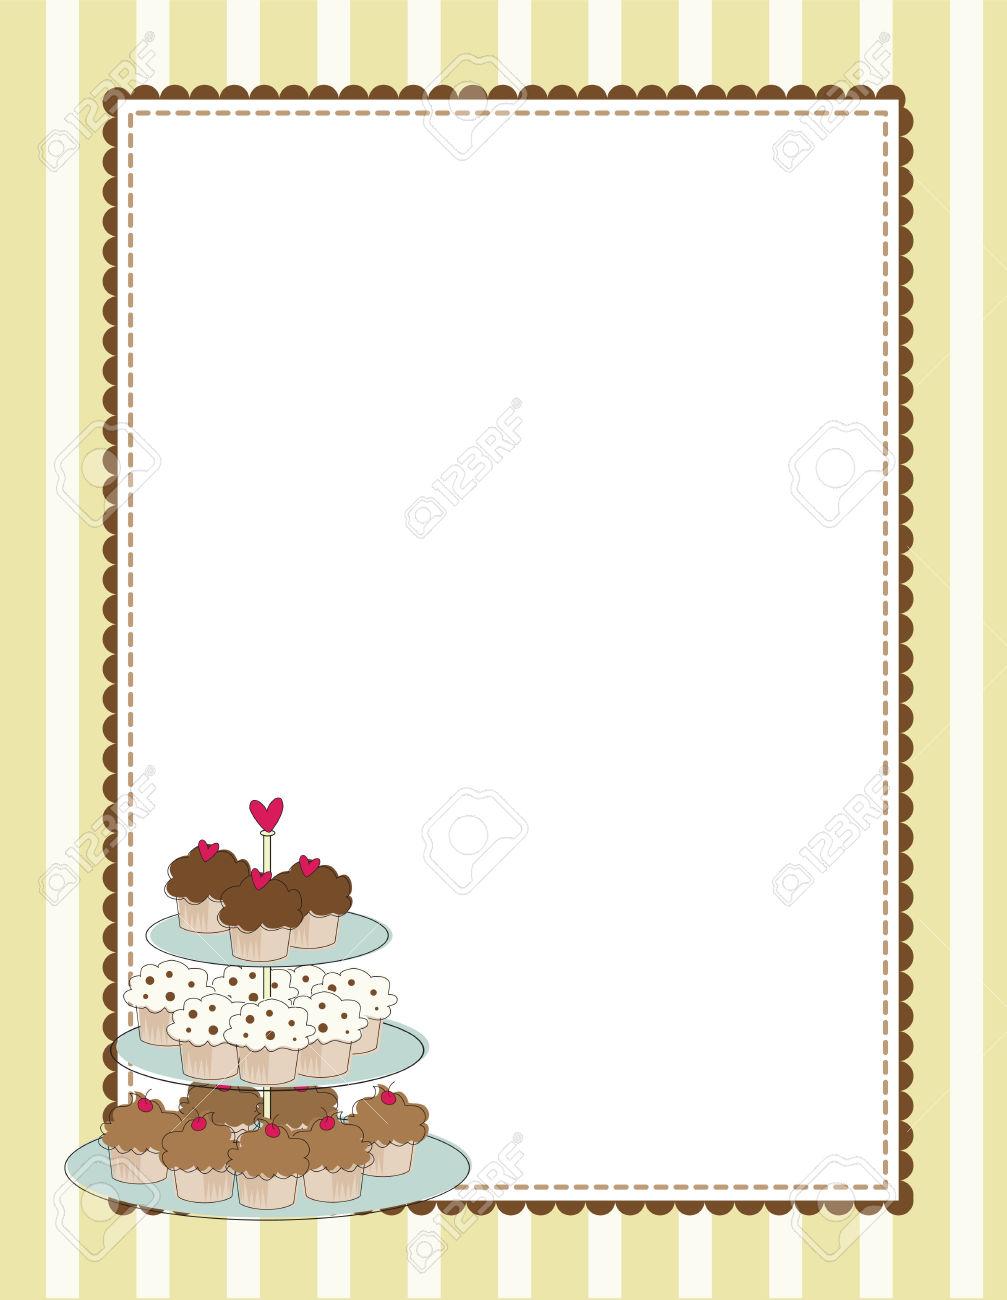 Cupcake border clipart free transparent download Best Cupcake Border Clip Art #21230 - Clipartion.com transparent download